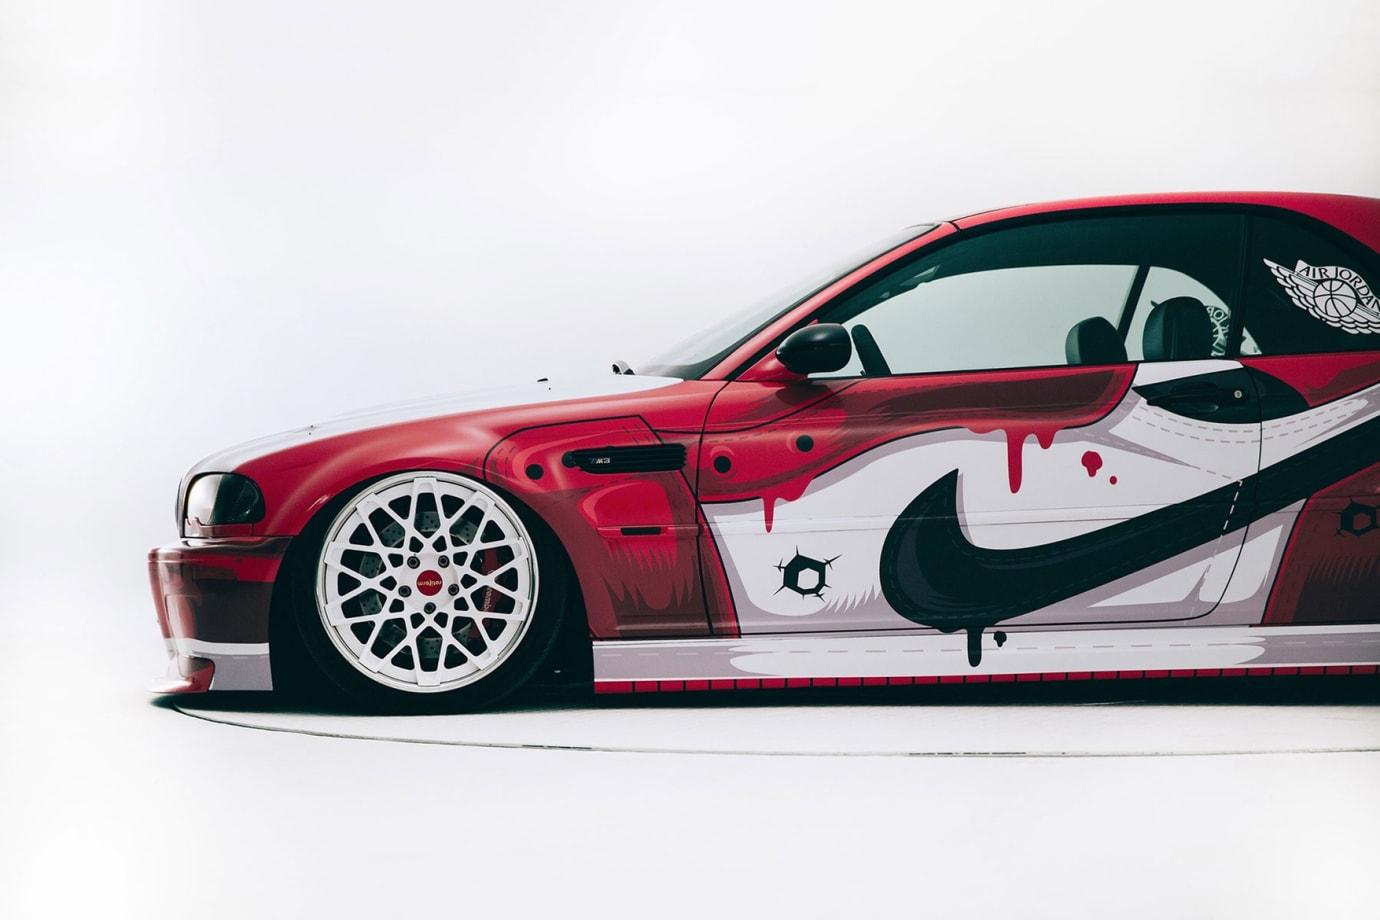 Air Jordan 1 Custom BMW (2)